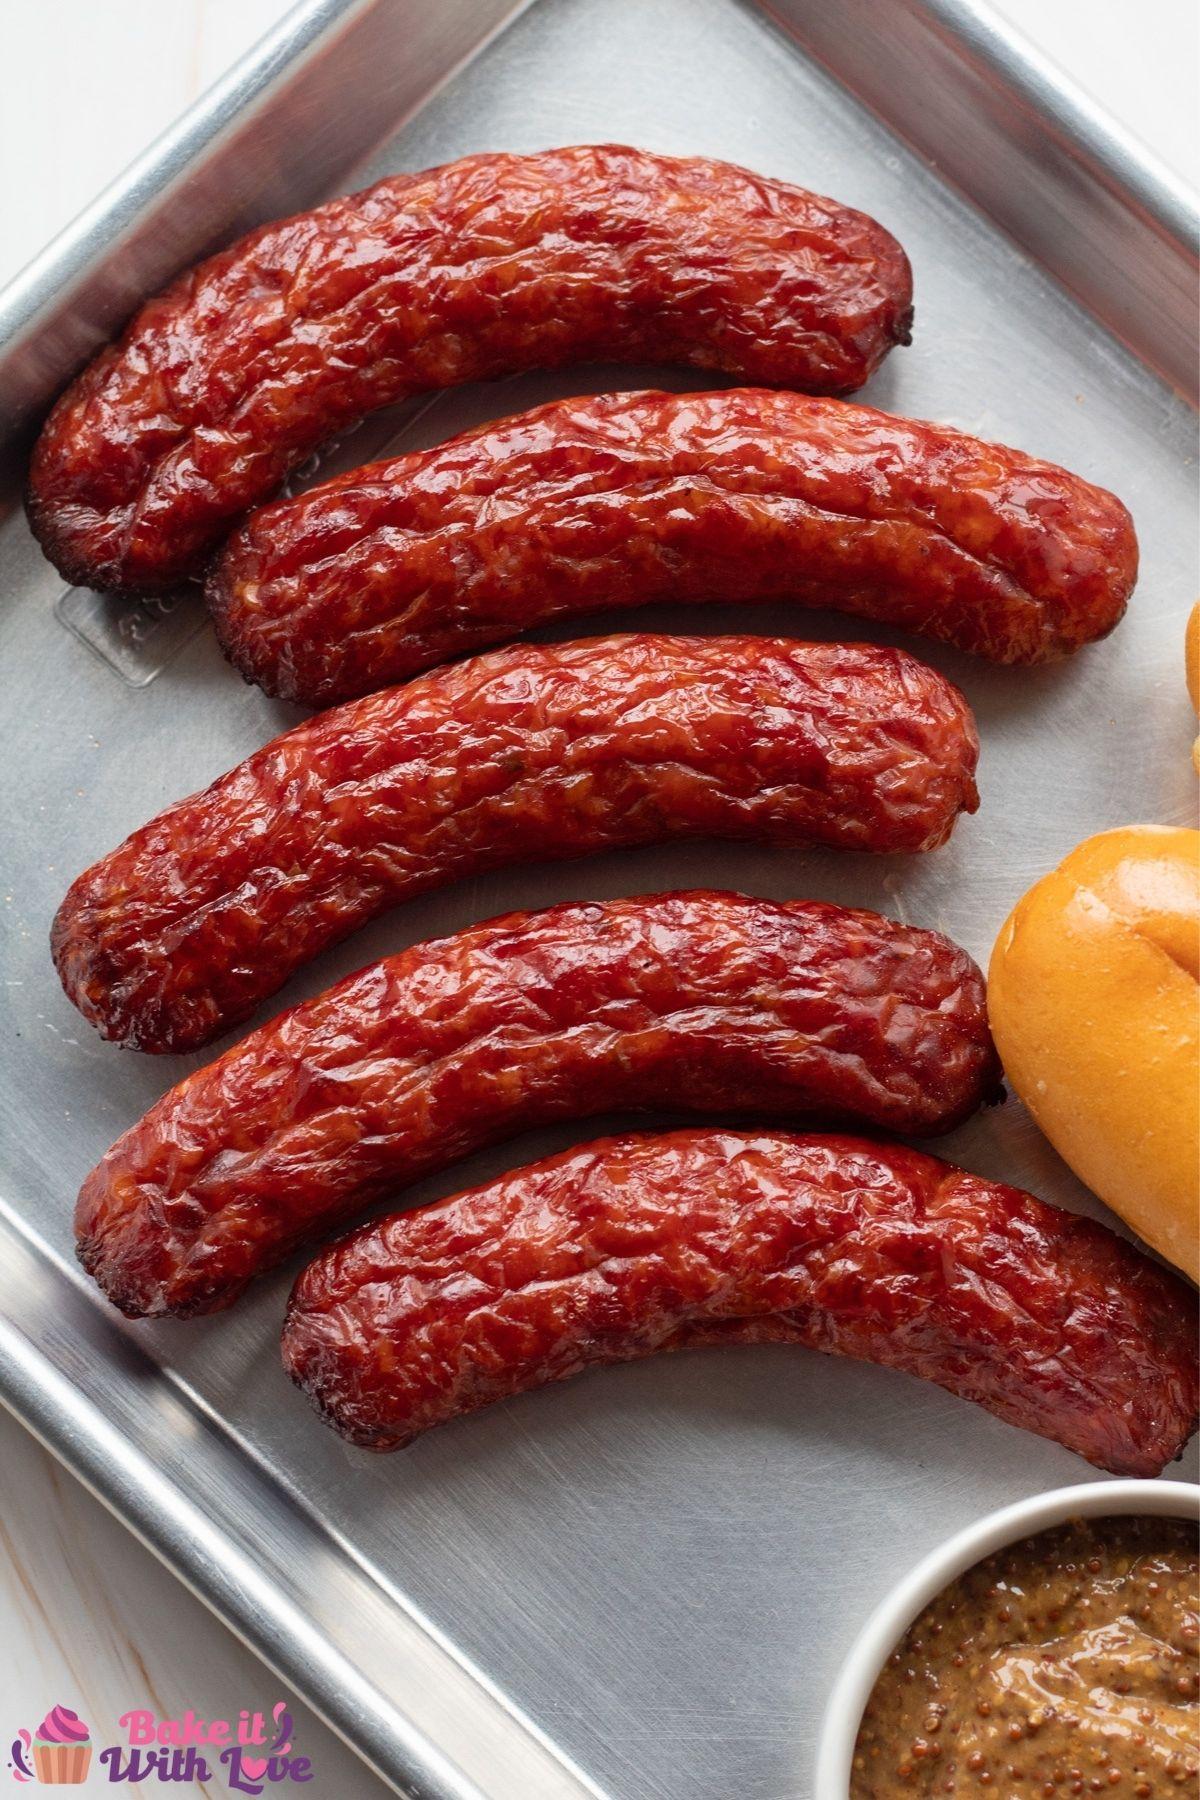 Tall overhead image of the smoked italian sausage on metal tray.